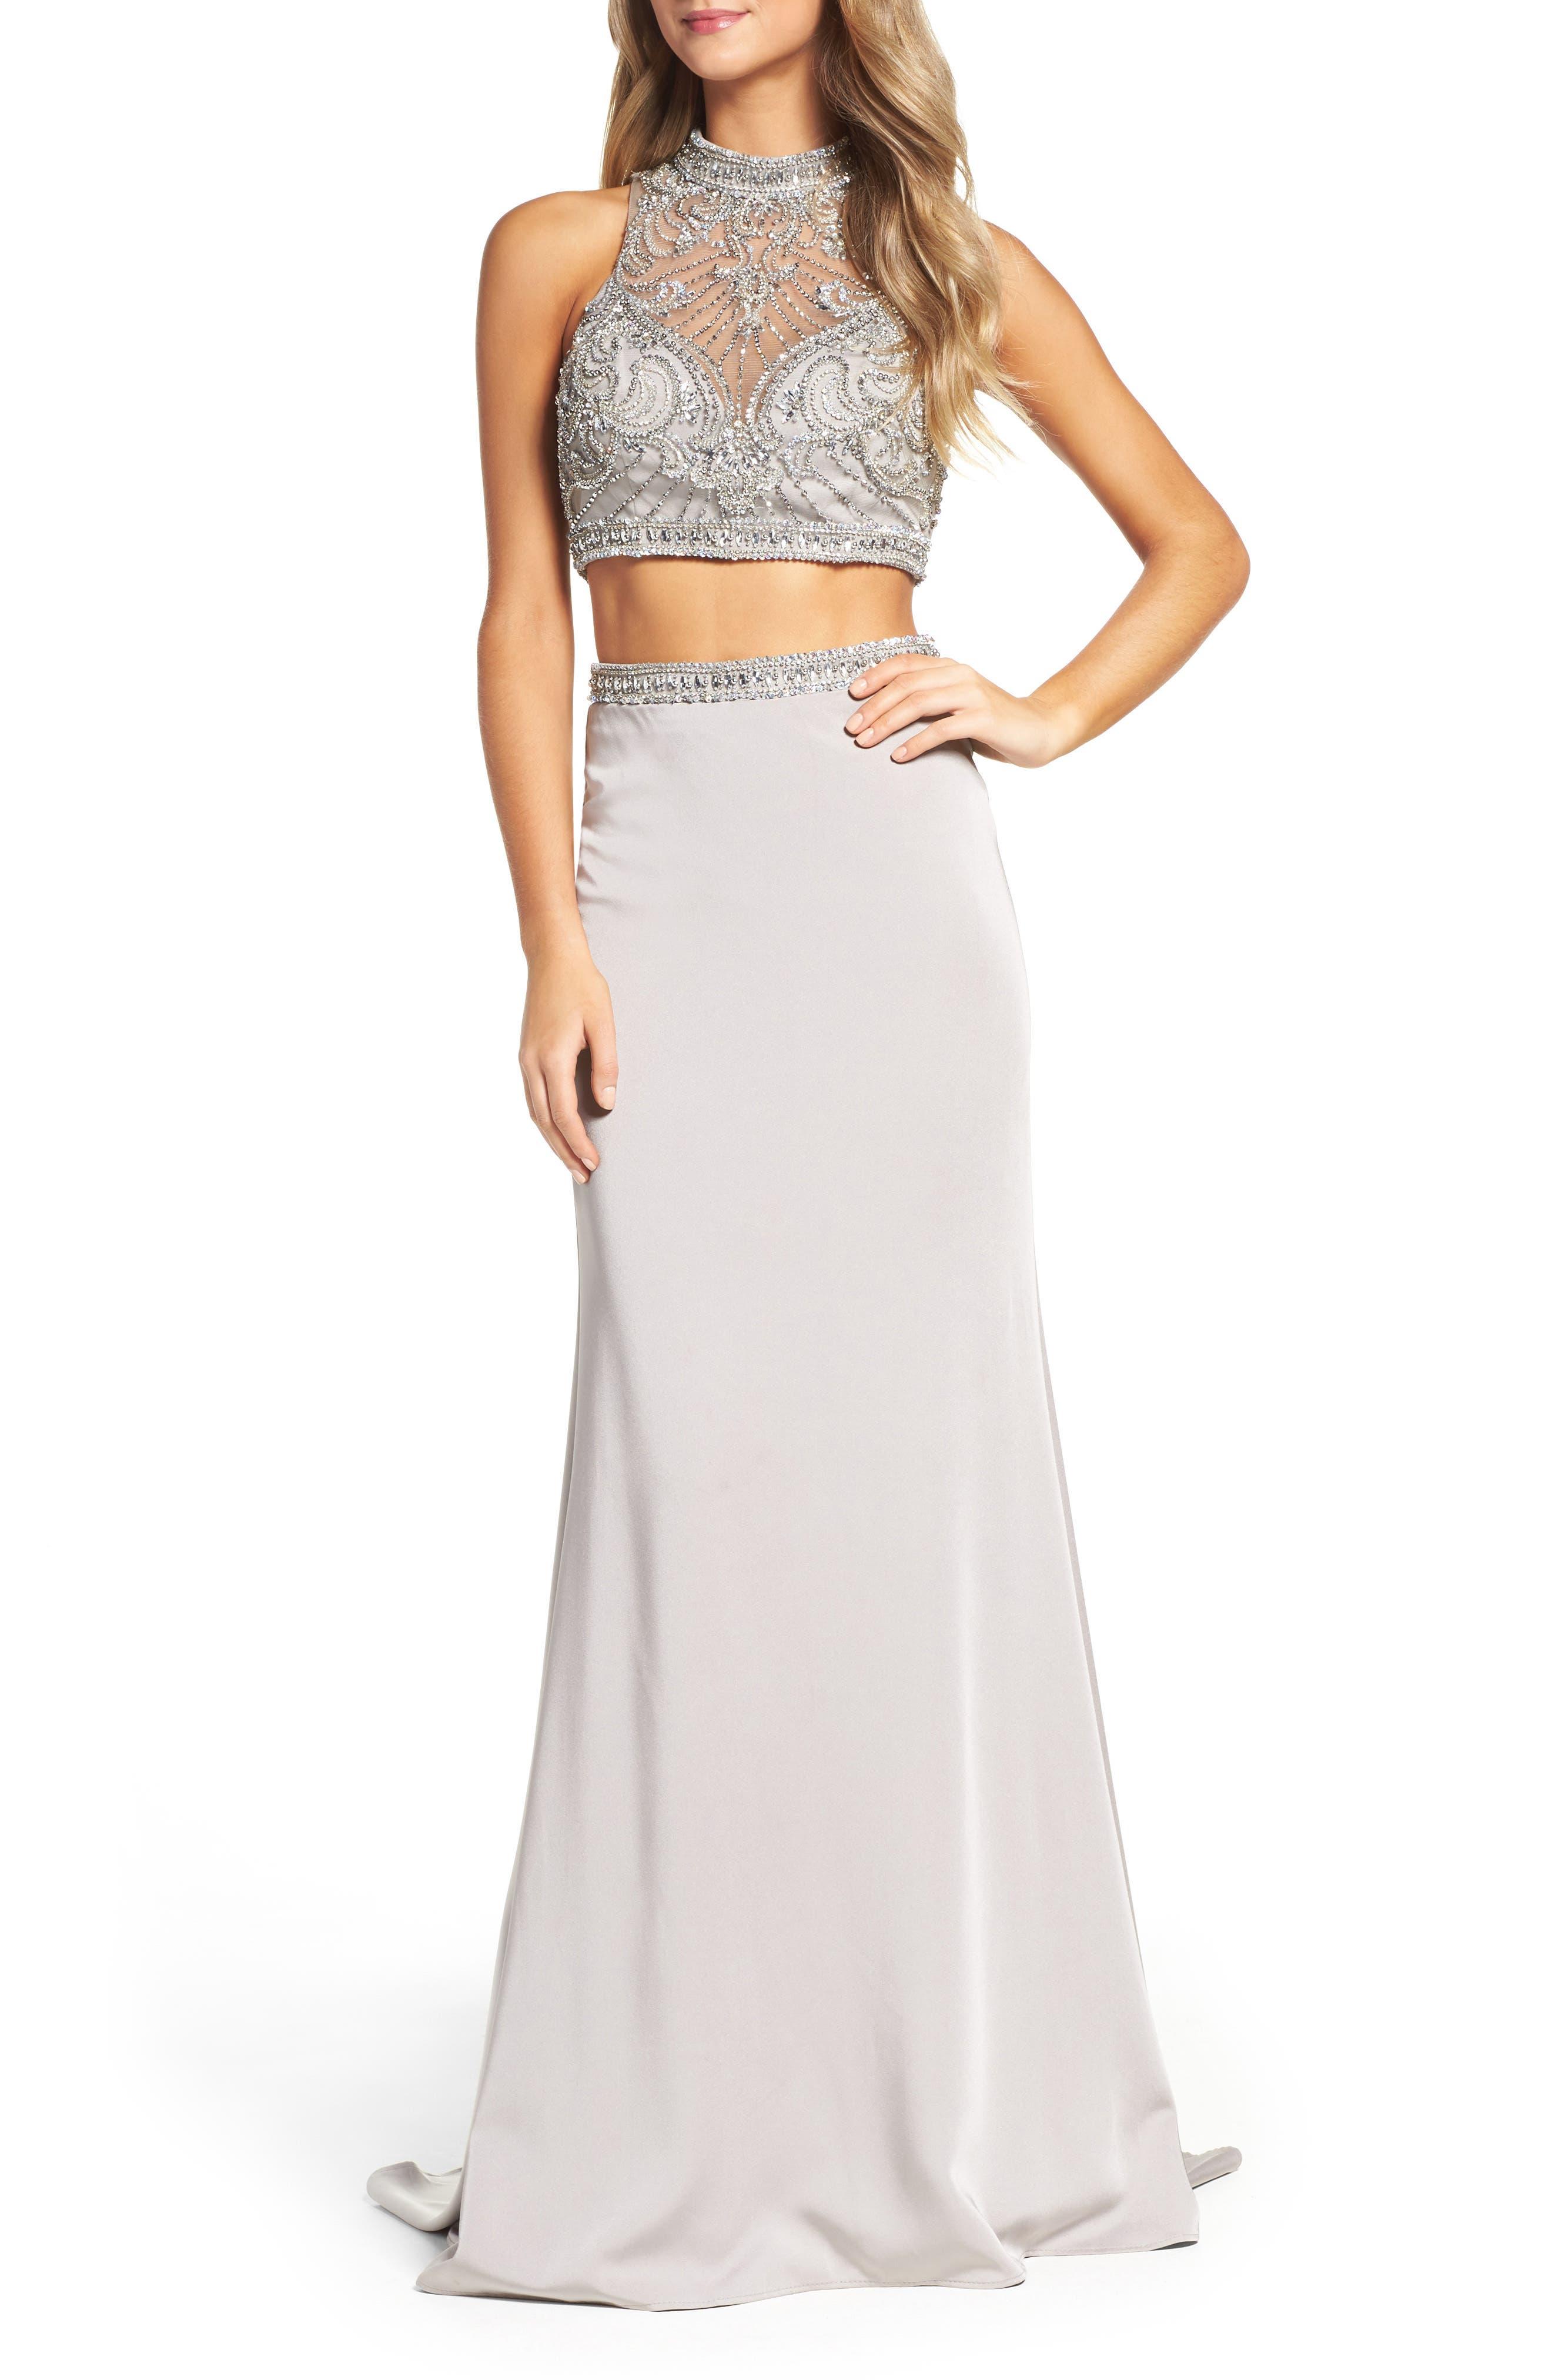 LA FEMME Embellished Two-Piece Gown